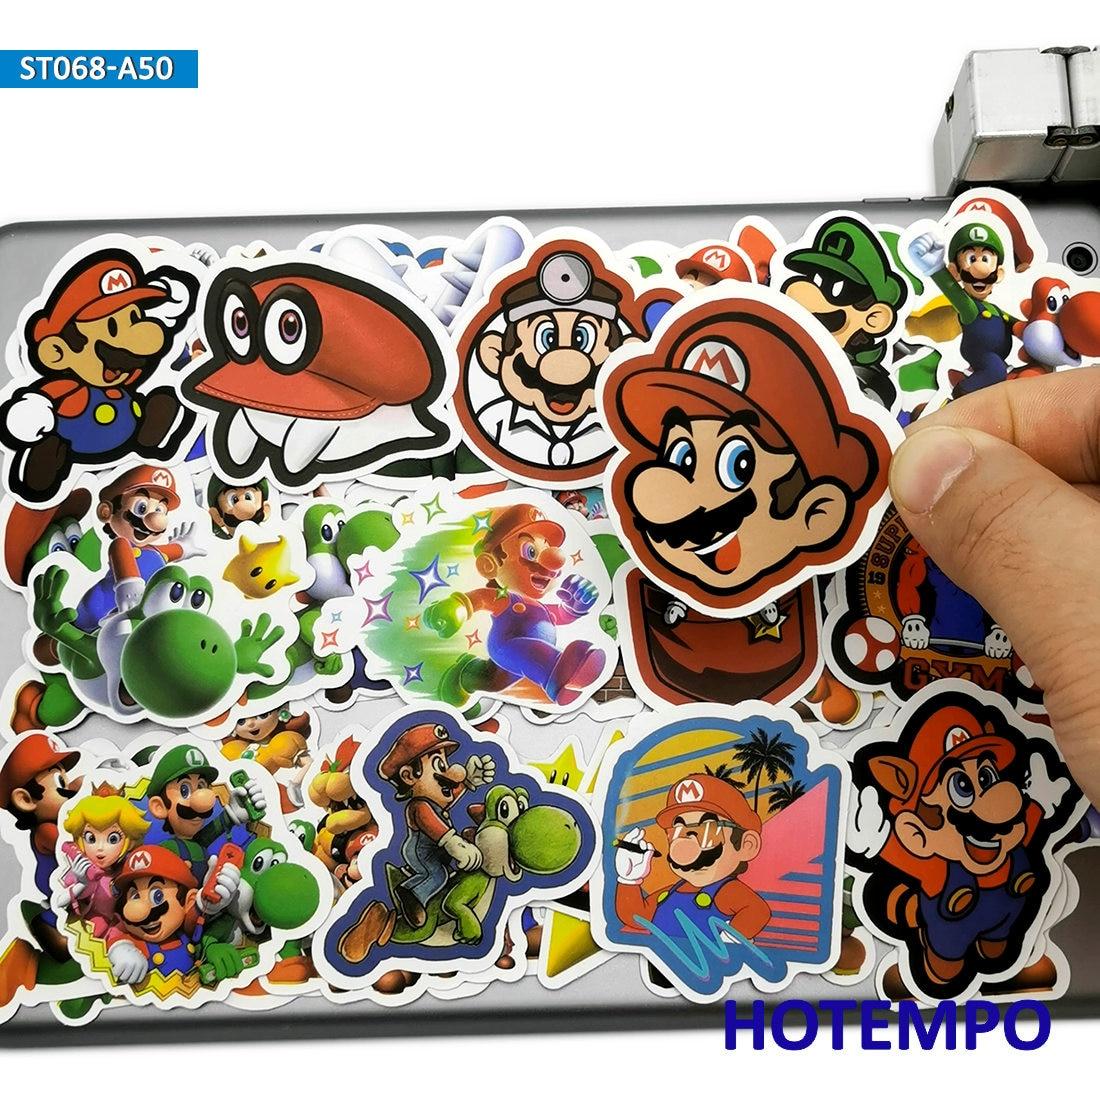 50pcs Cartoon Super Hero Mario Luigi Games Stickers font b Toys b font for Mobile font